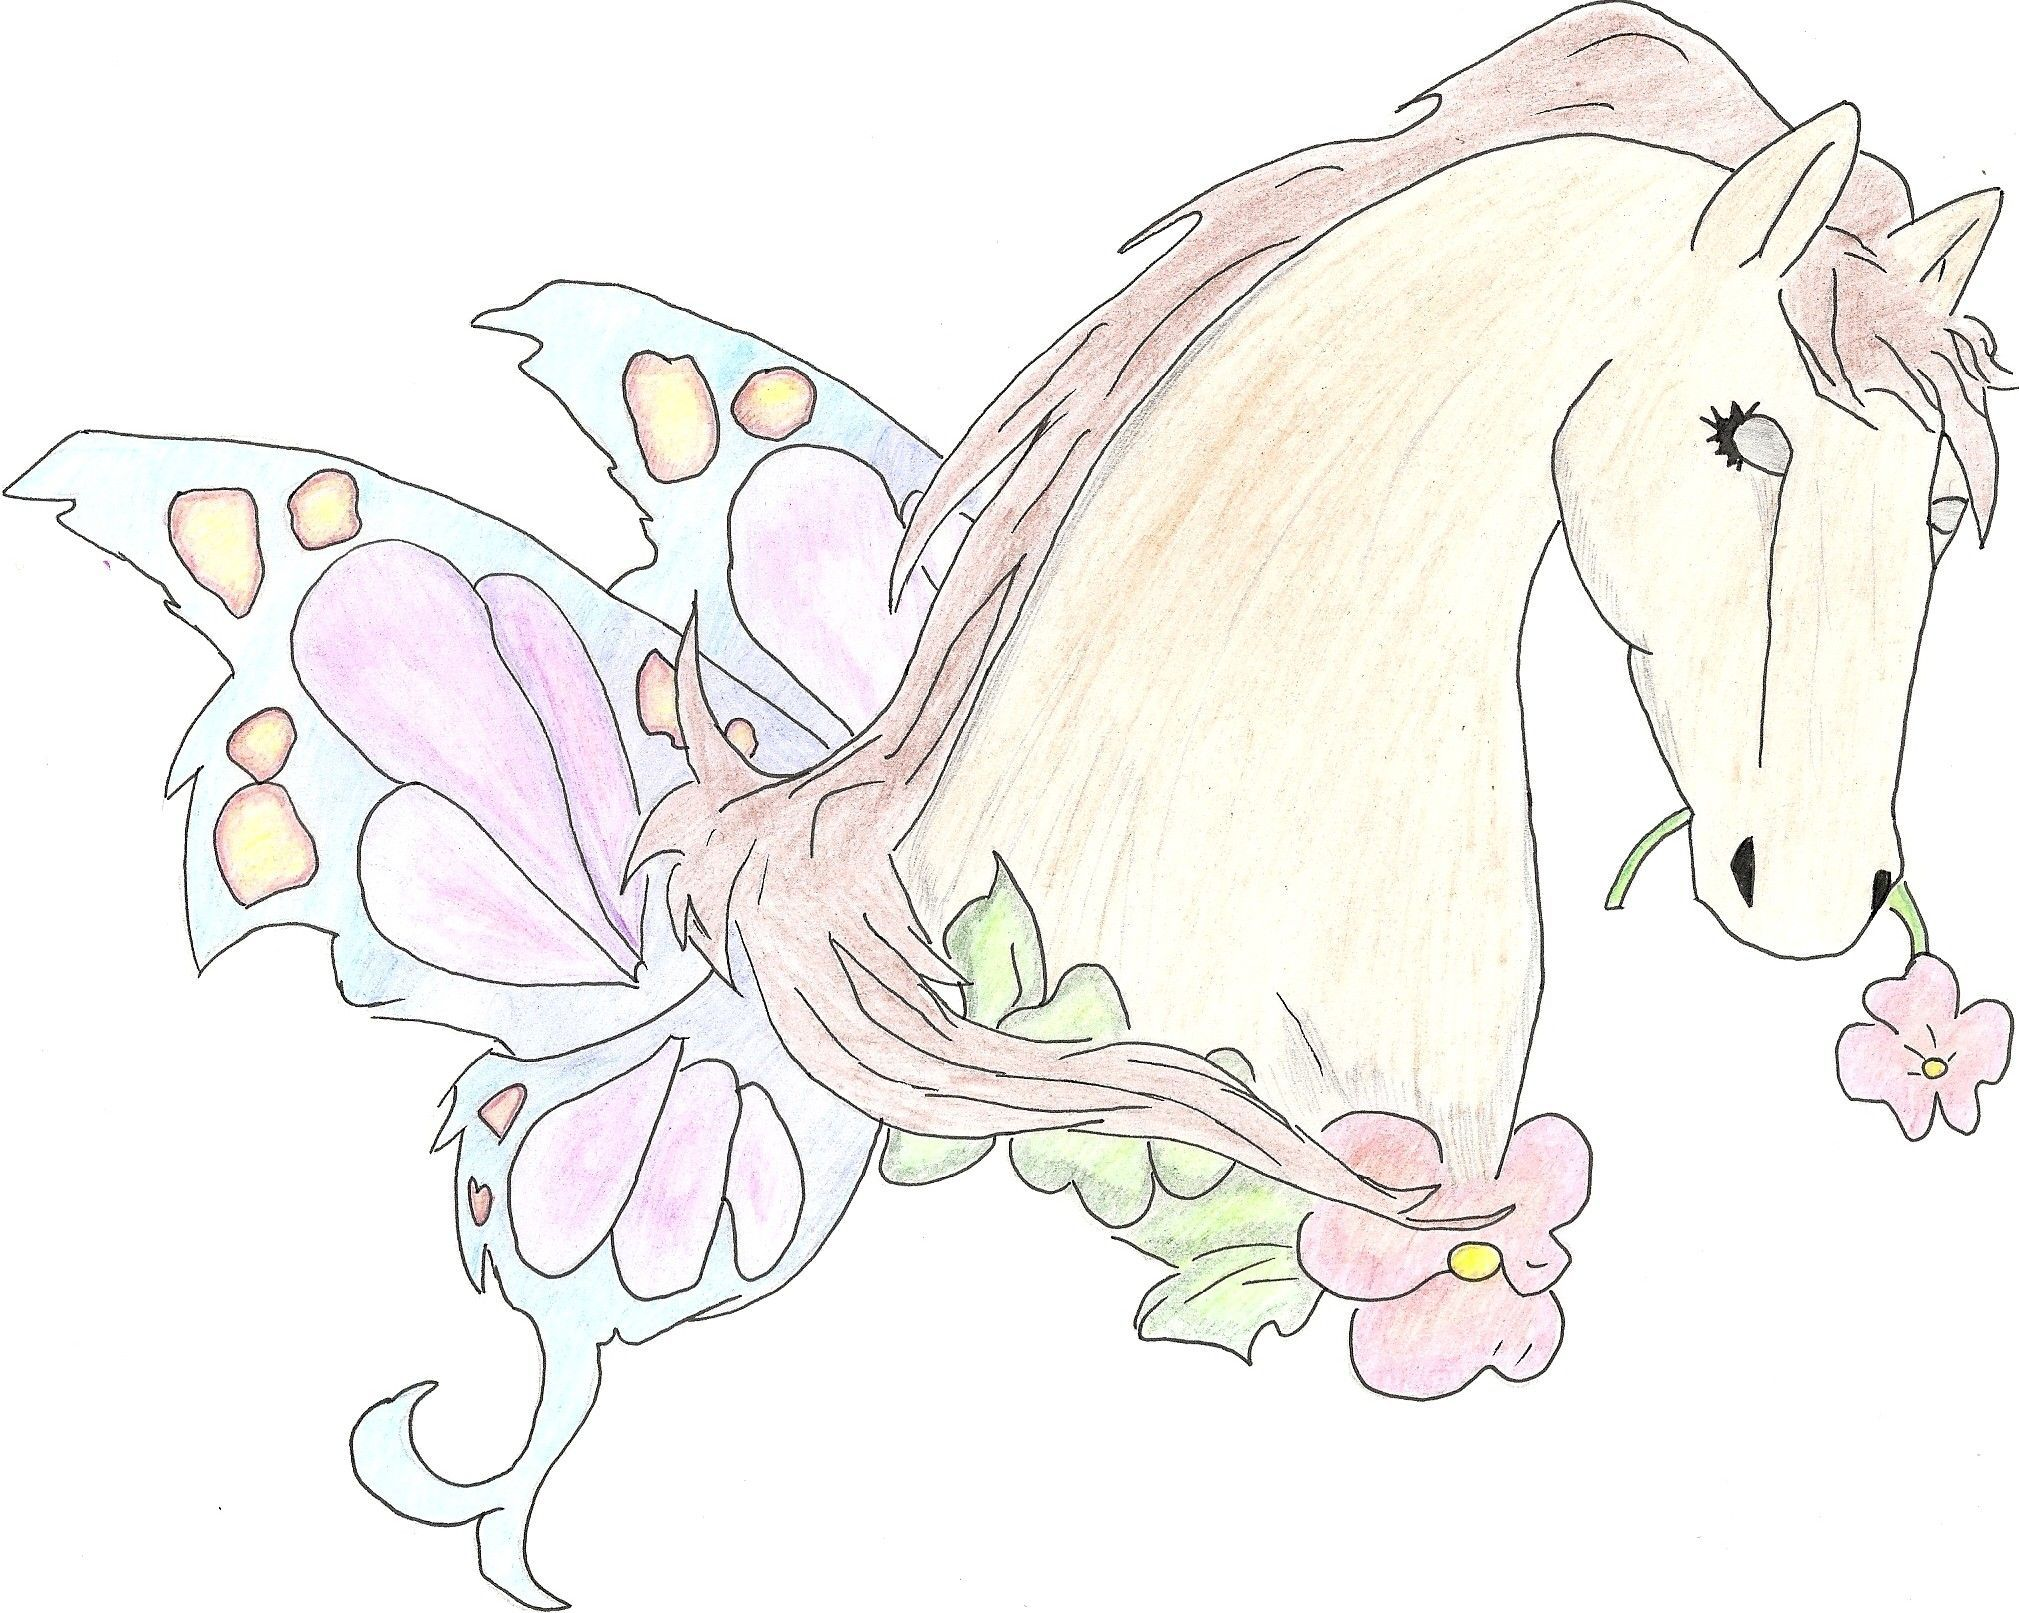 Dessin de fleurs en arabesque pelautscom tattoo tattooskid - Dessin fleur de lys ...